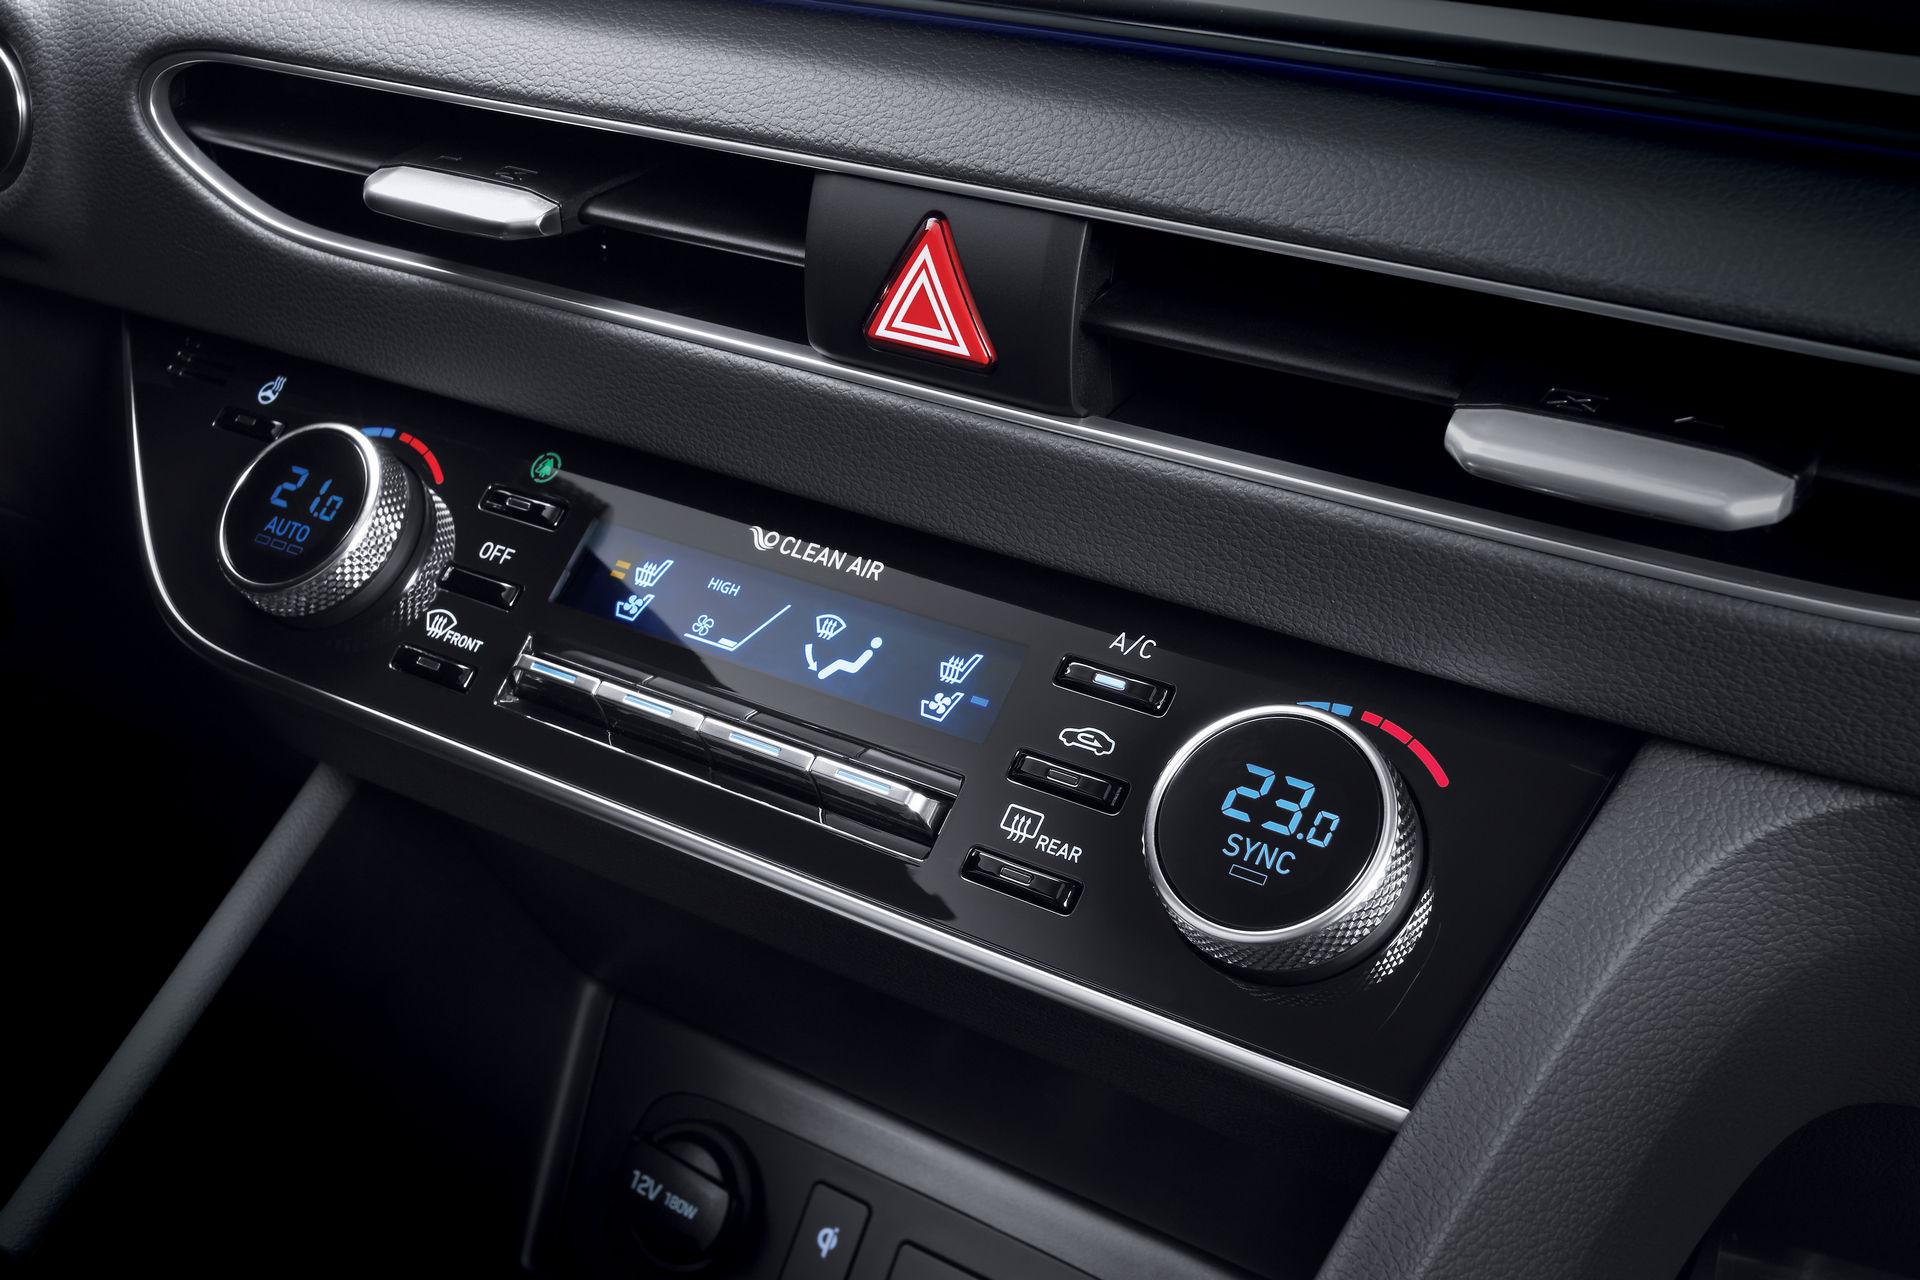 Hyundai-Air-Conditioning-system-clima-12